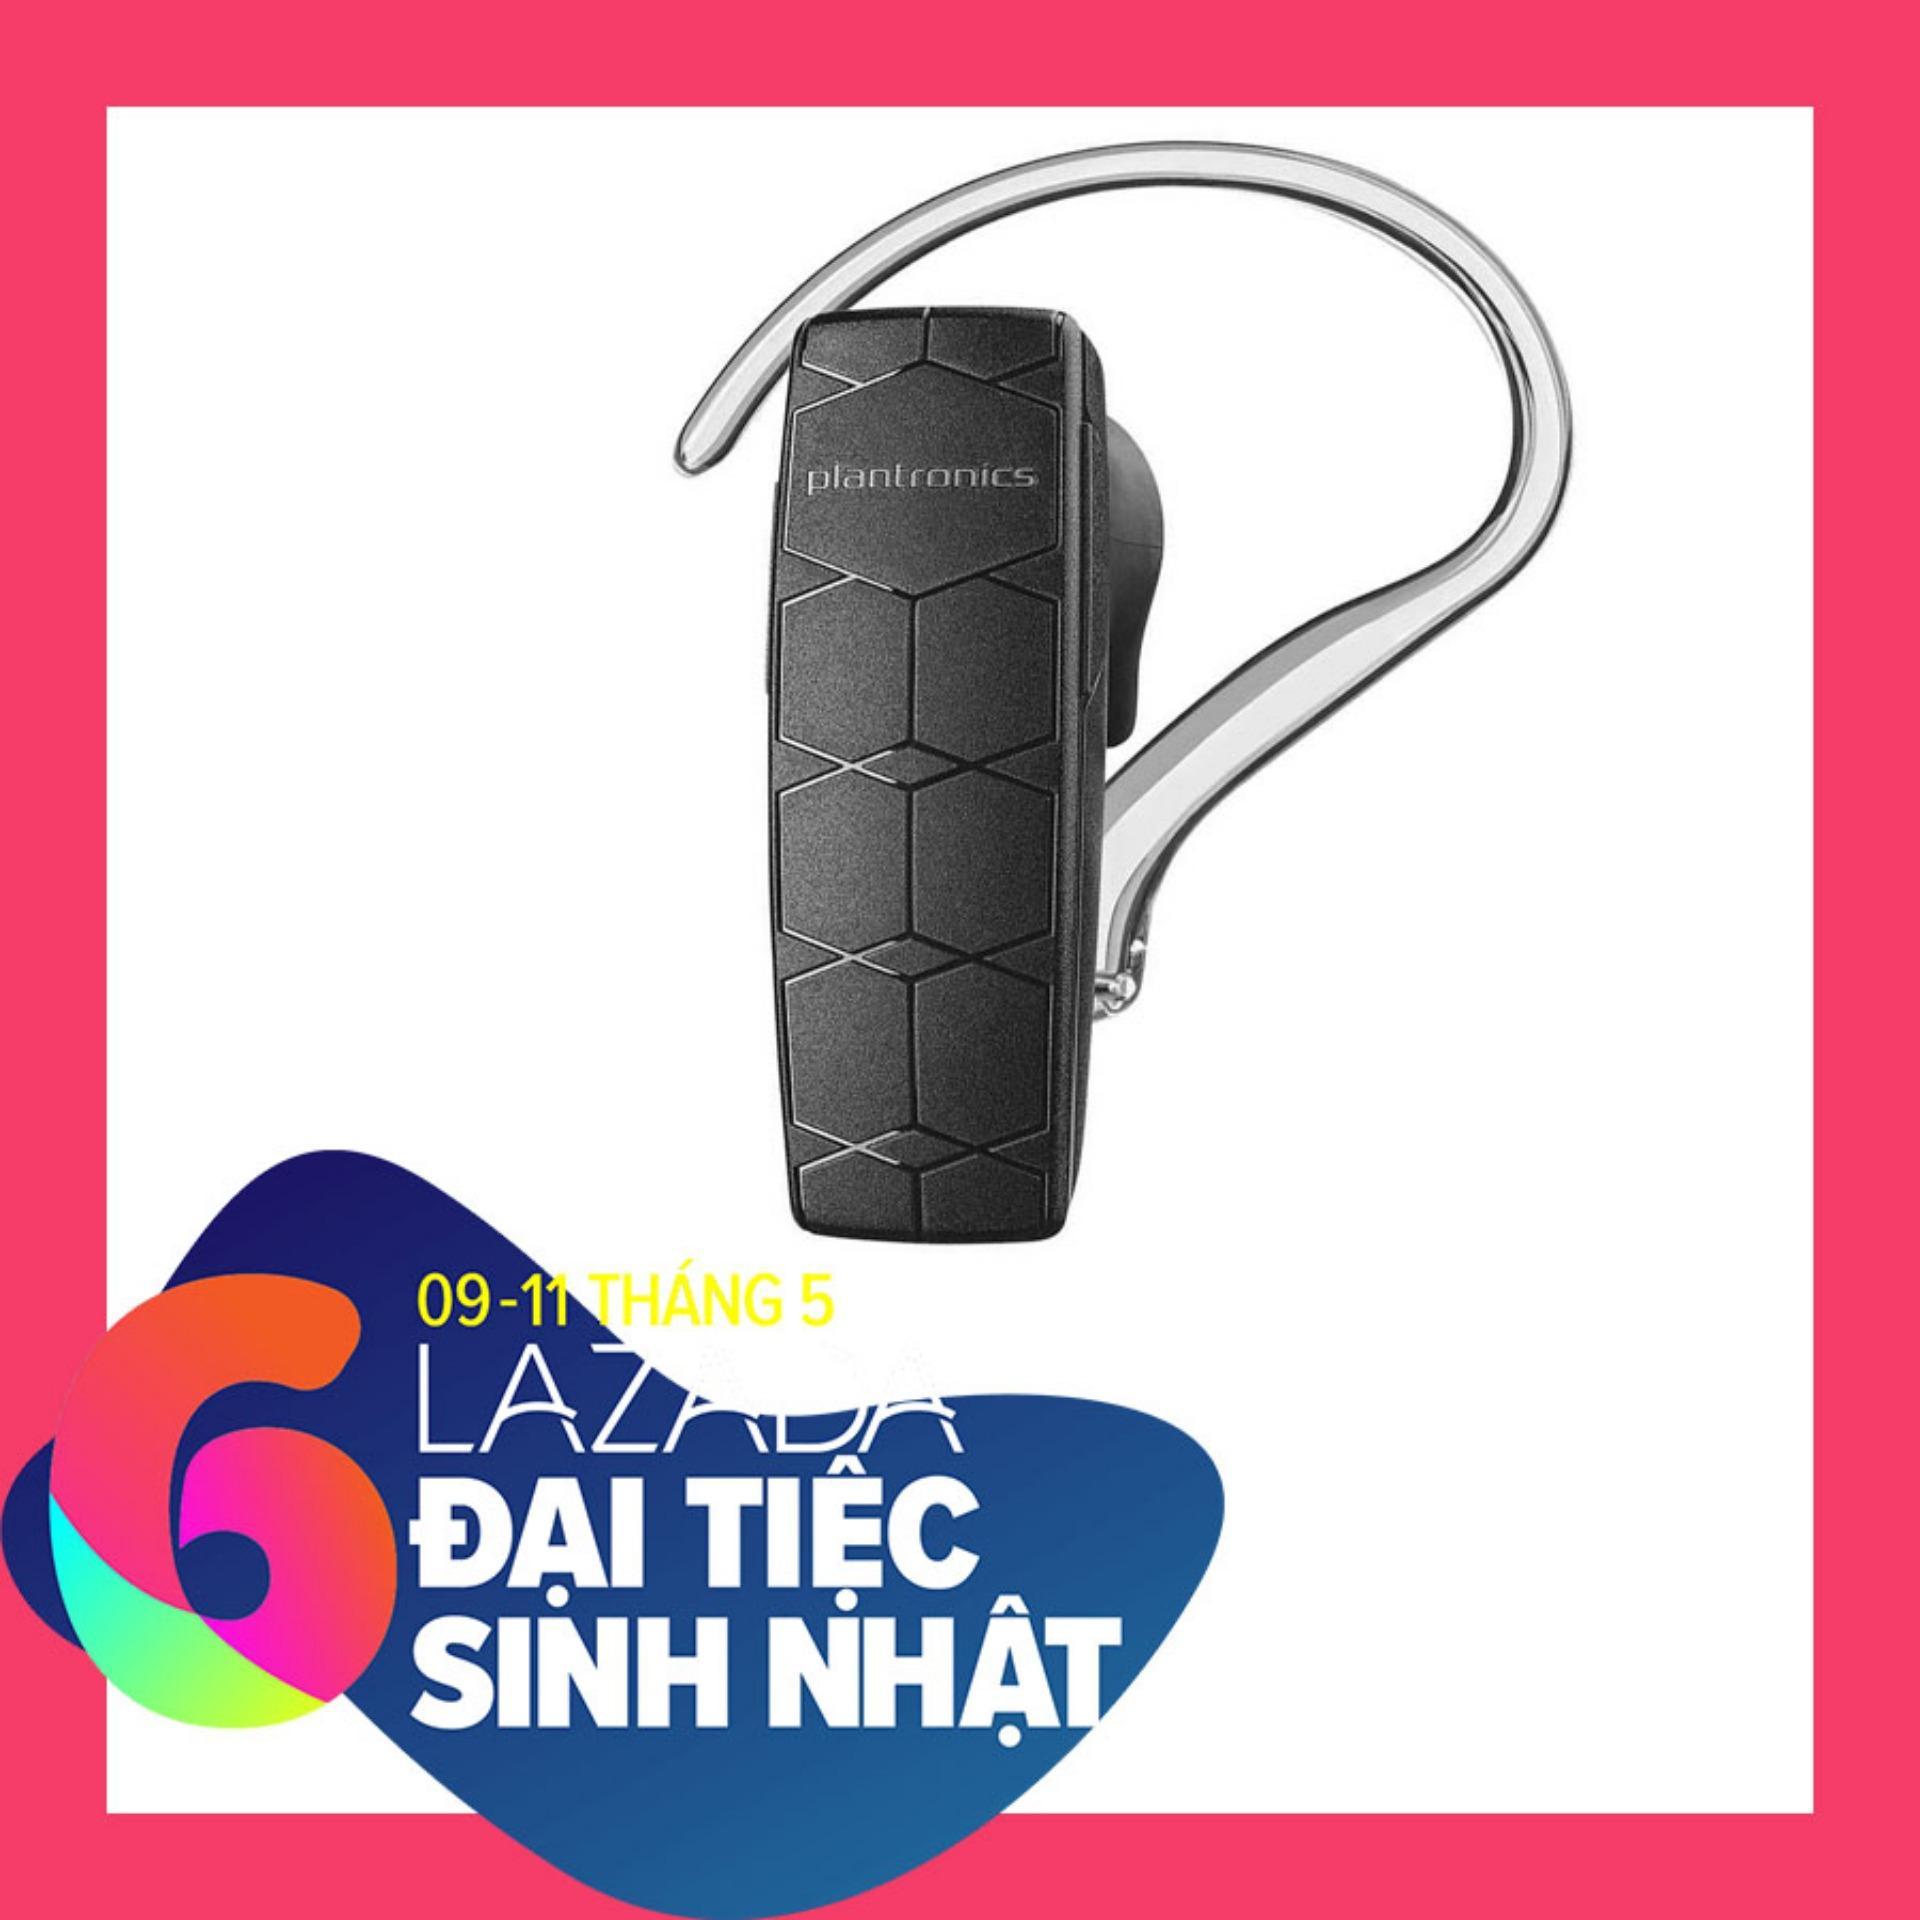 Giá Bán Tai Nghe Bluetooth Plantronics Explorer 50 Plantronics